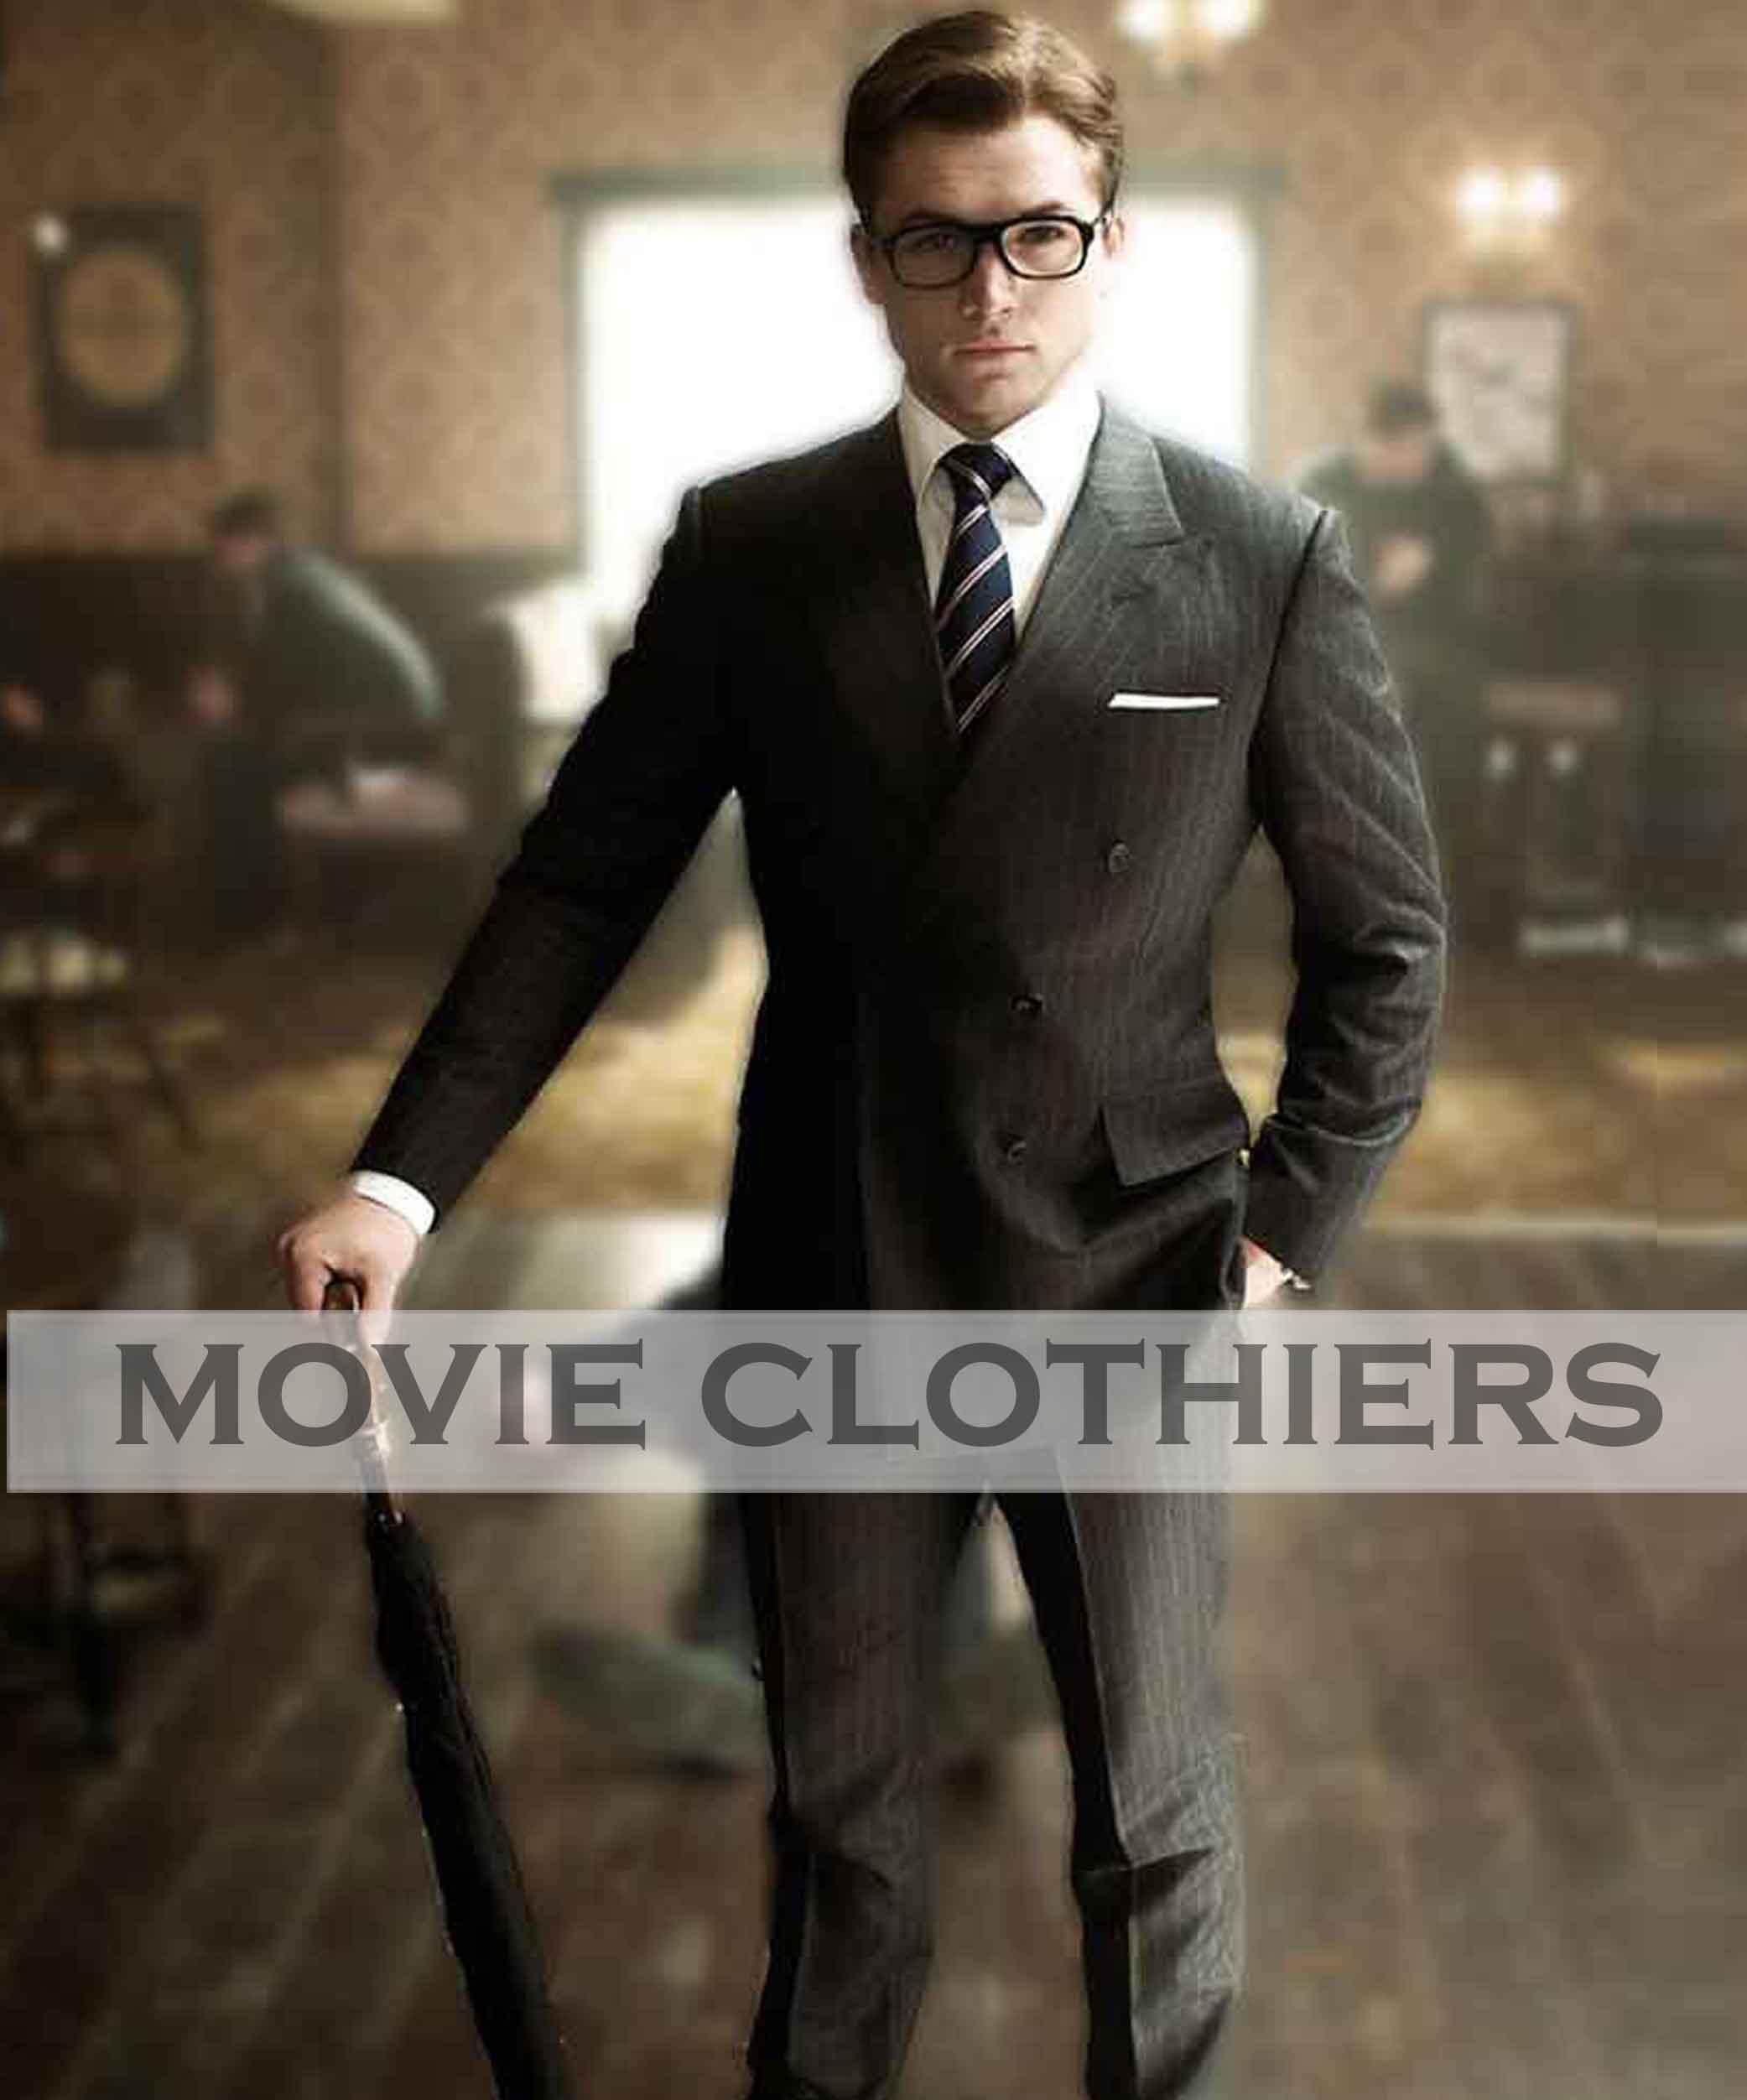 Kingsman Taron Egerton Suit